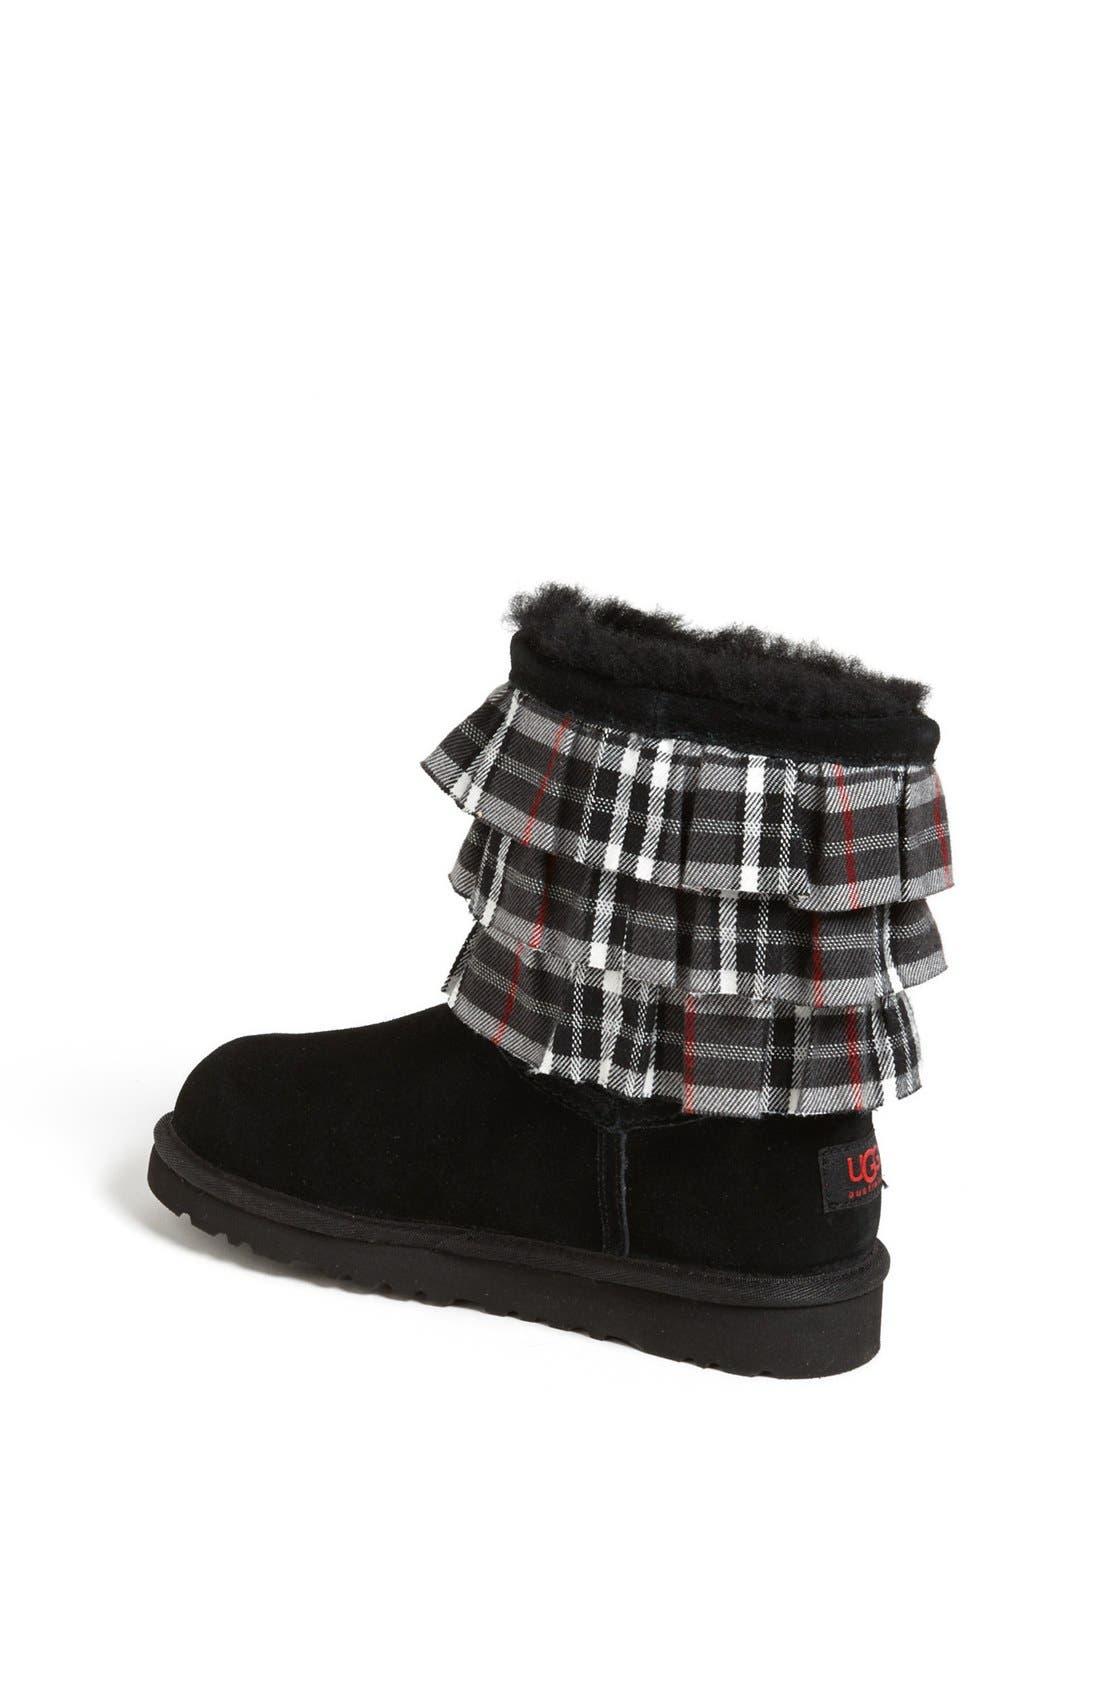 Alternate Image 2  - UGG® Australia 'Eloise' Boot (Toddler, Little Kid & Big Kid)